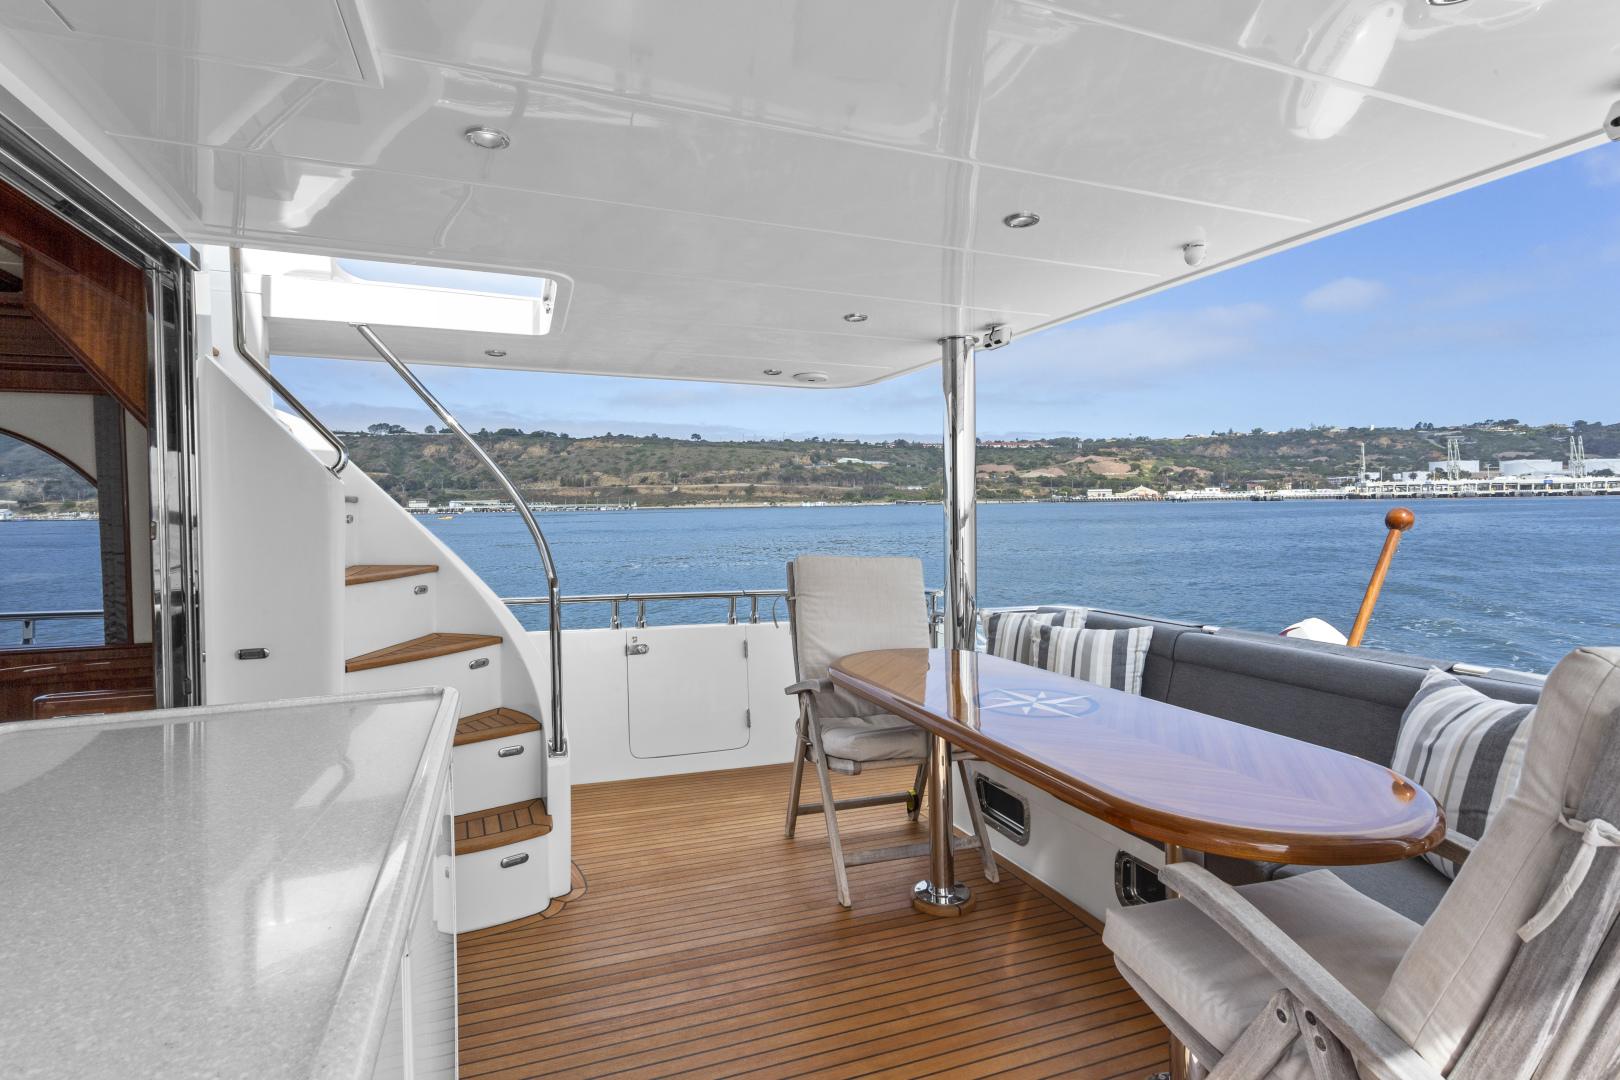 Hampton-76 Skylounge Motoryacht 2014-ODYSEA San Diego-California-United States-AFT DECK-1165180 | Thumbnail